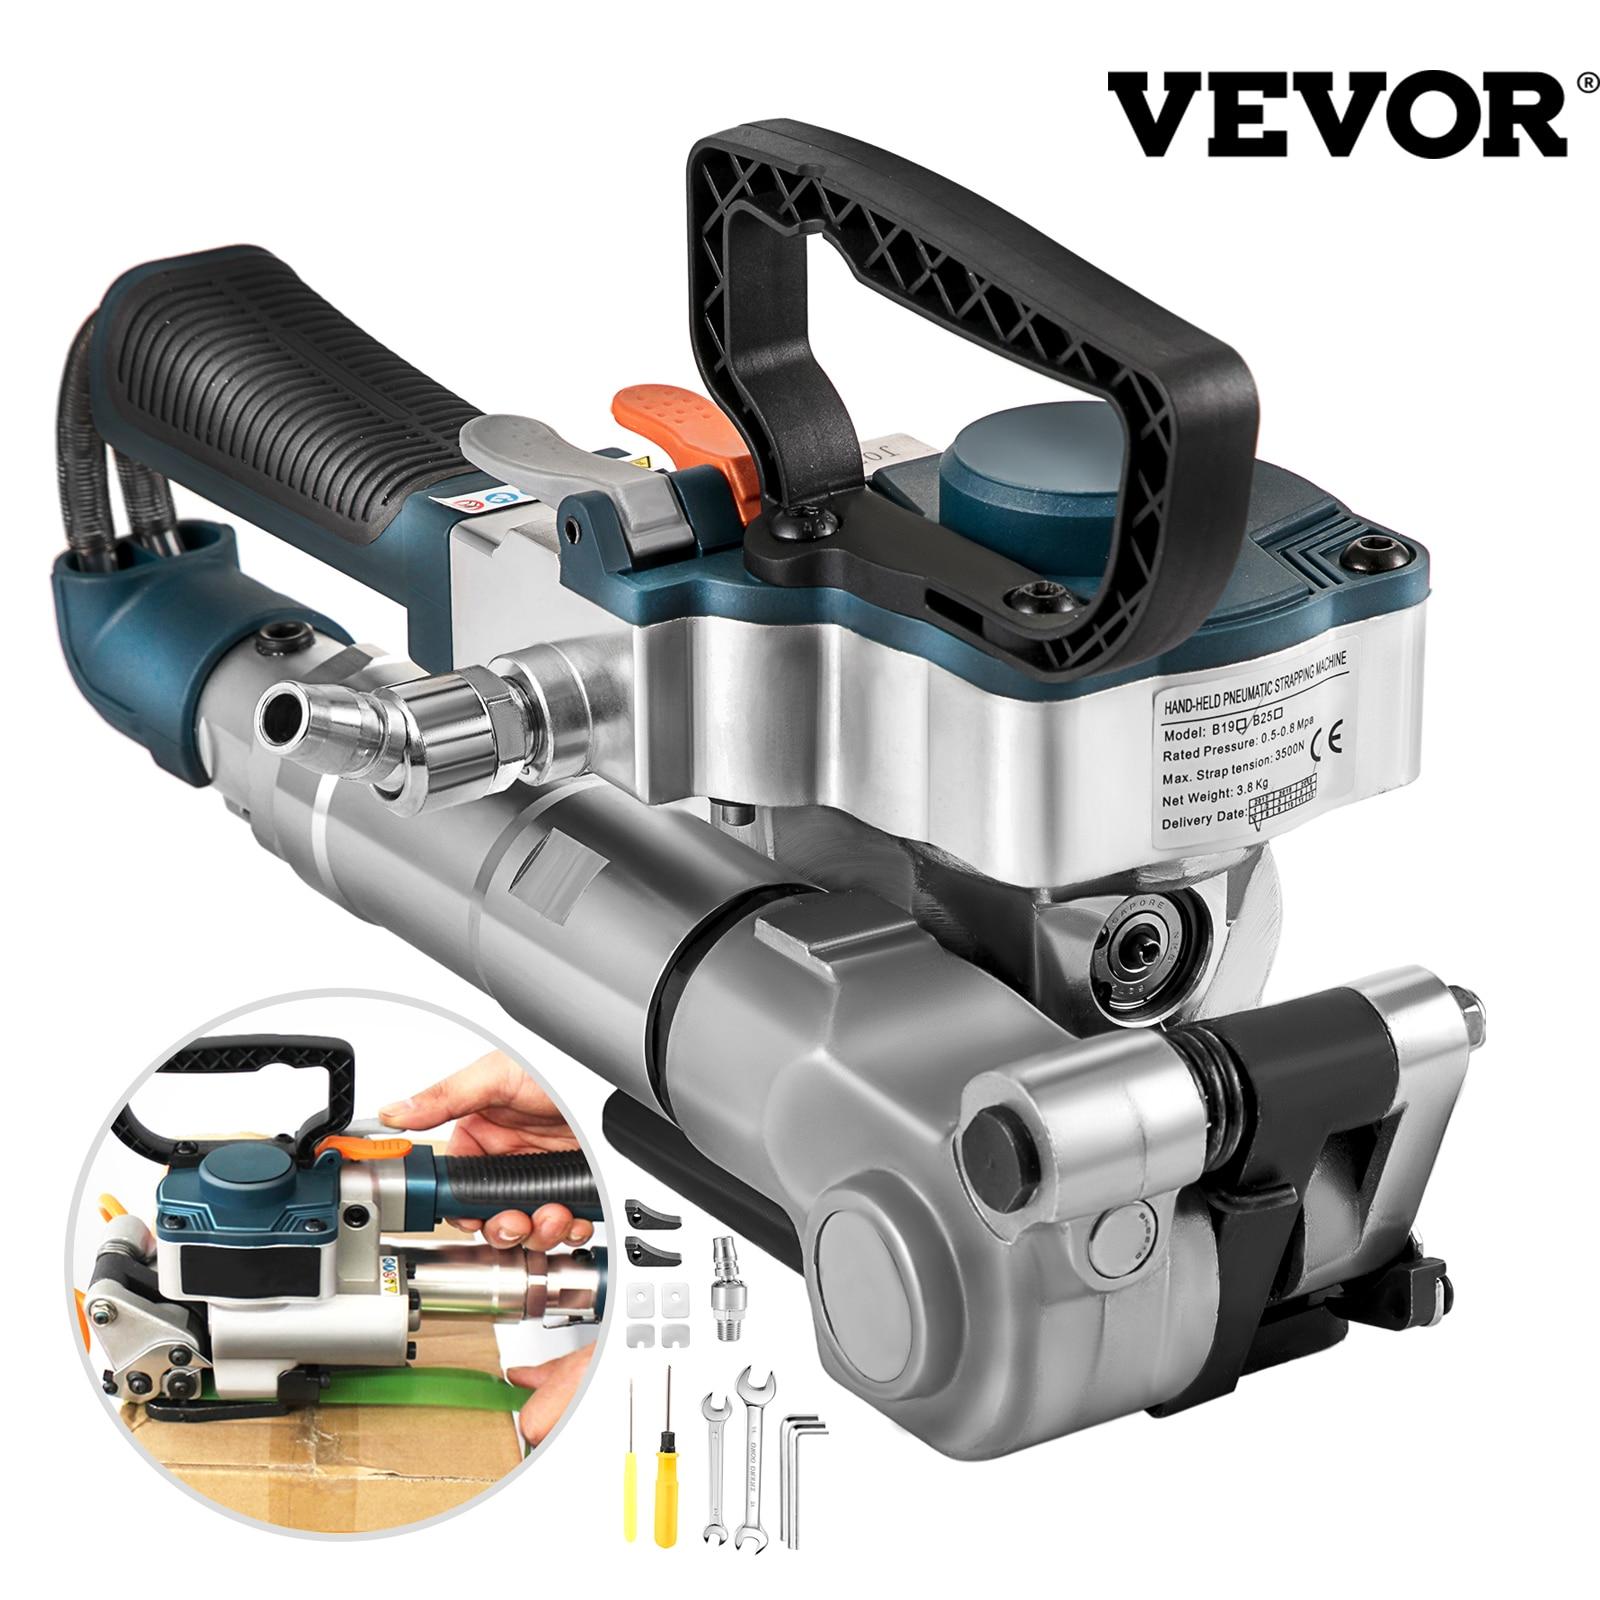 VEVOR B19 يده هوائي الربط آلة 3500N ماكس التوتر اليد التعبئة آلة التفاف أدوات ل 13-19 مللي متر PP فست بحزام للحيوانات الأليفة